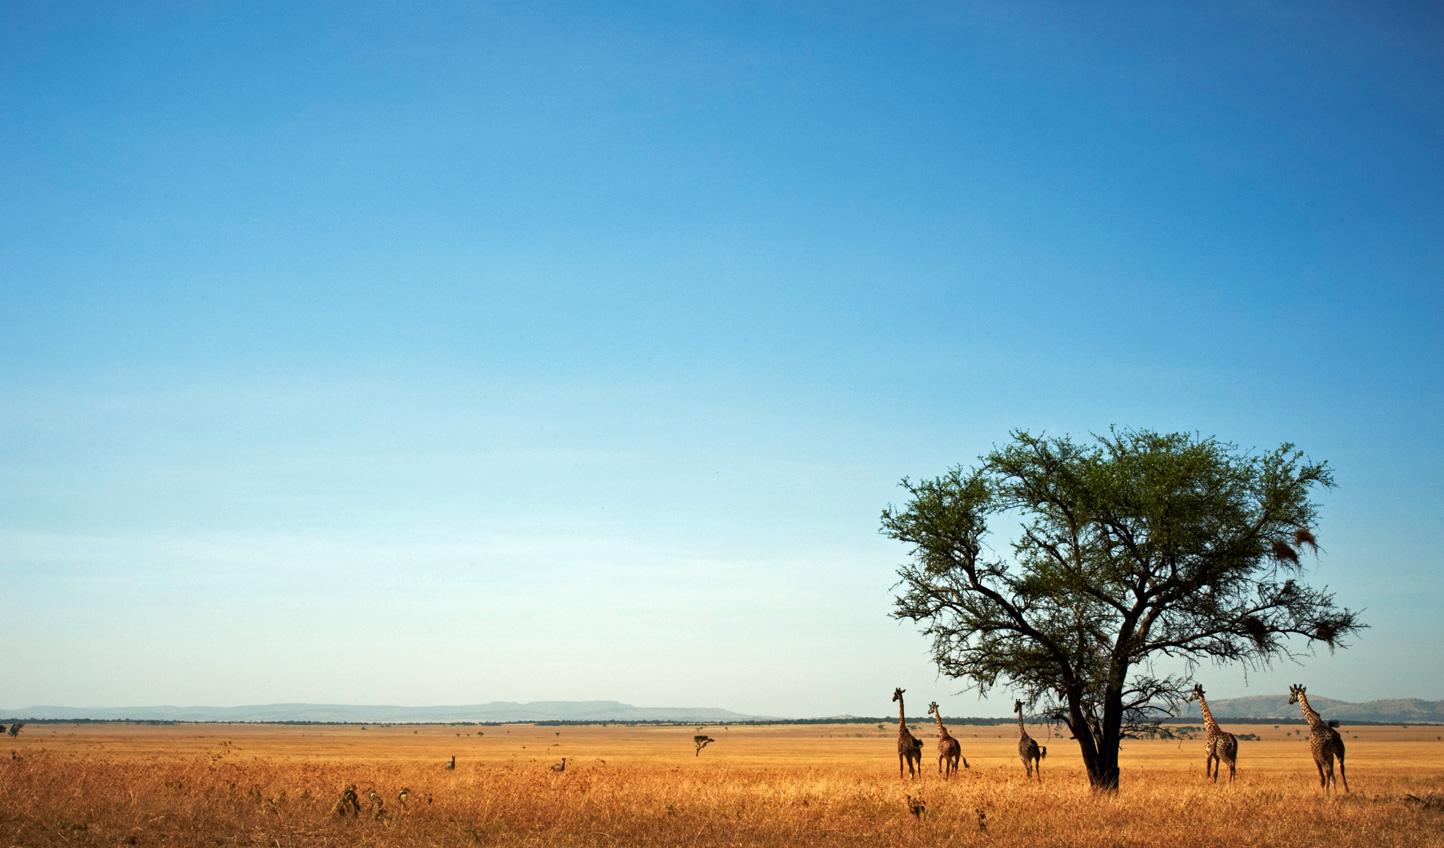 Giraffe on the plains of the Serengeti